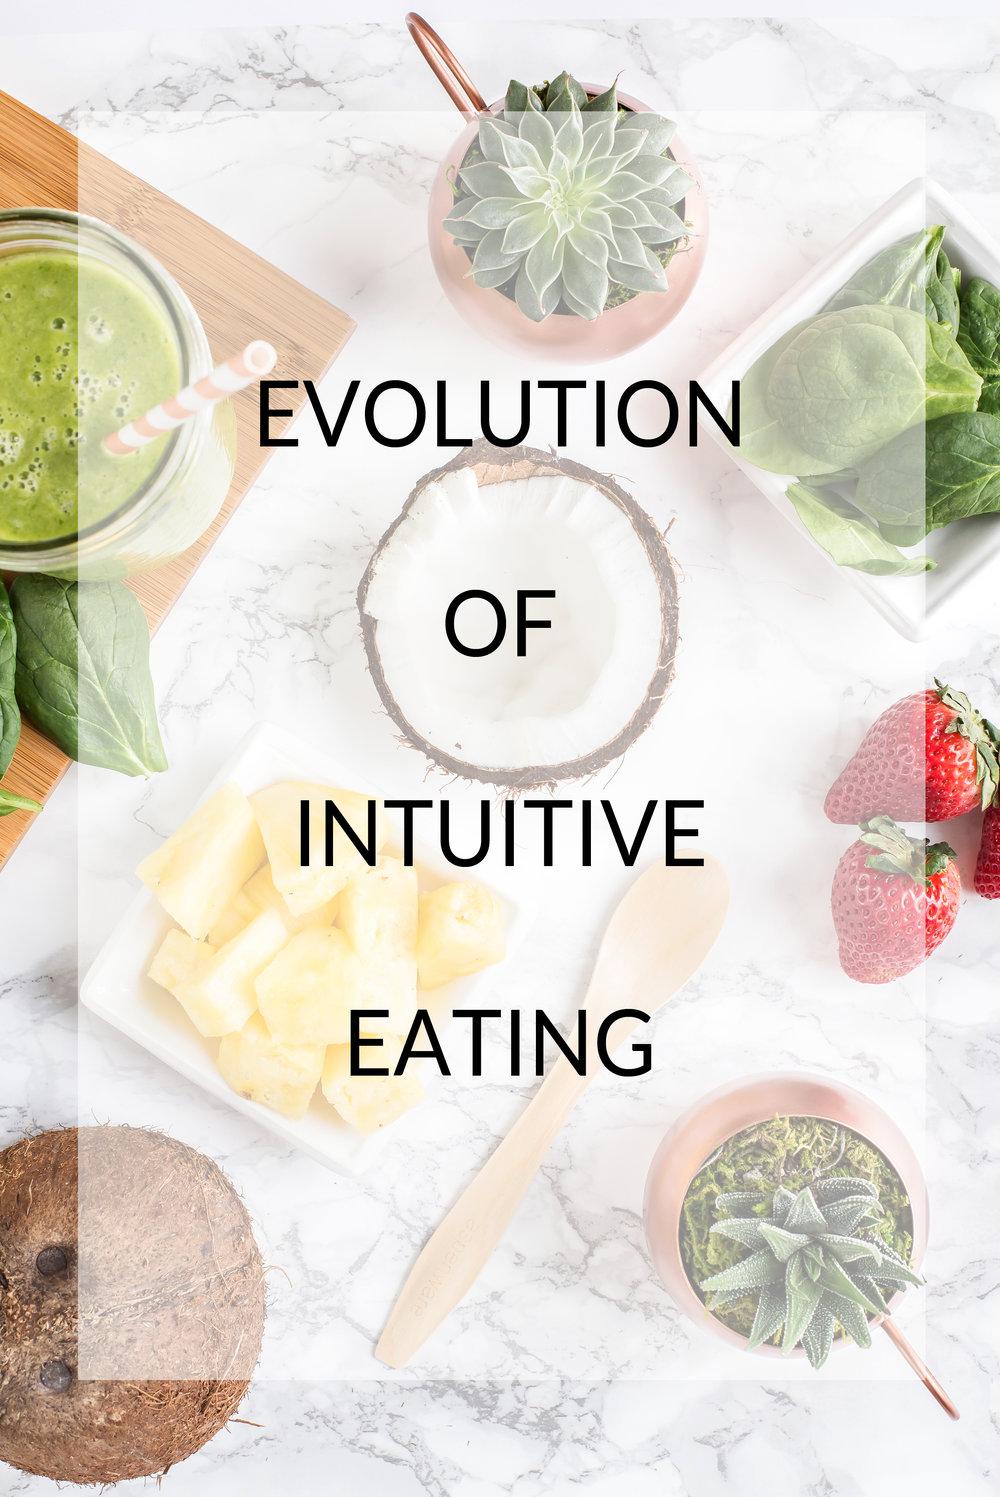 Evolution-of-Intuitive-Eating-PINTEREST.jpg